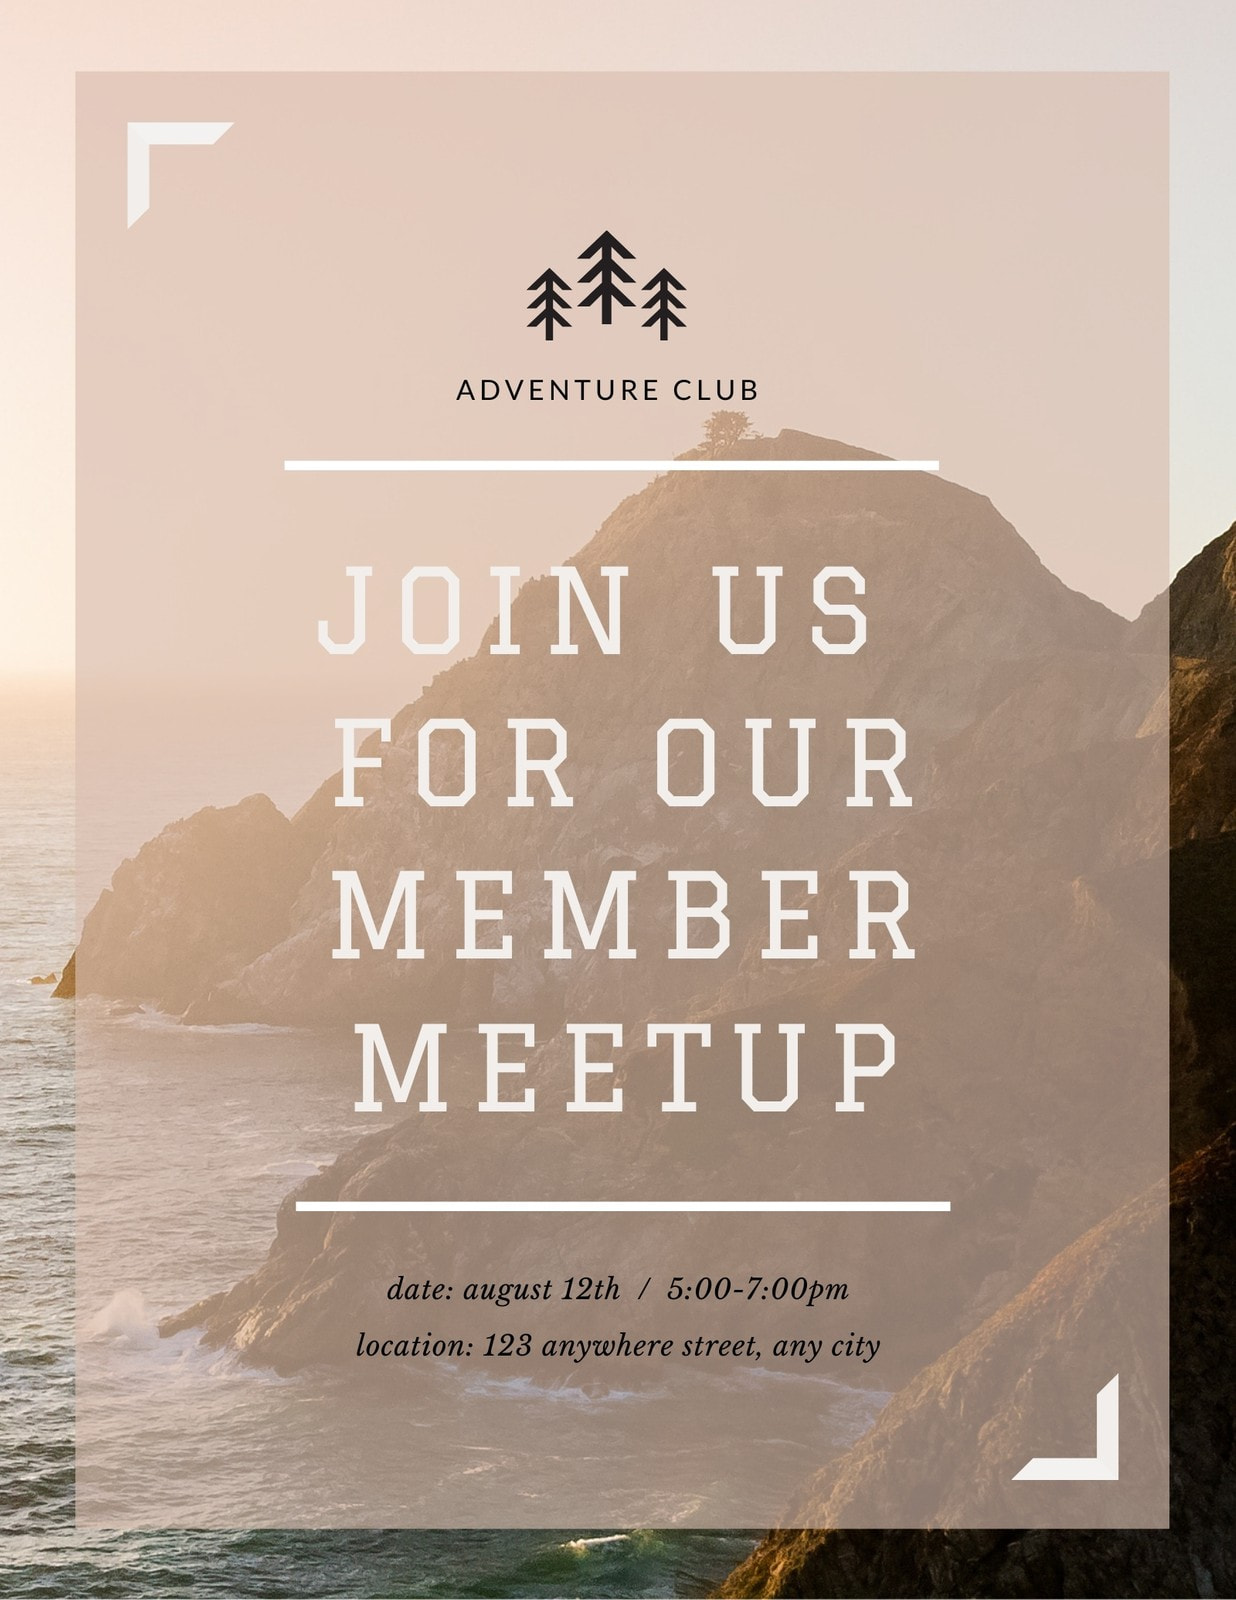 Outdoor Adventure Flyer for Events, Surprise Parties, & Meetings